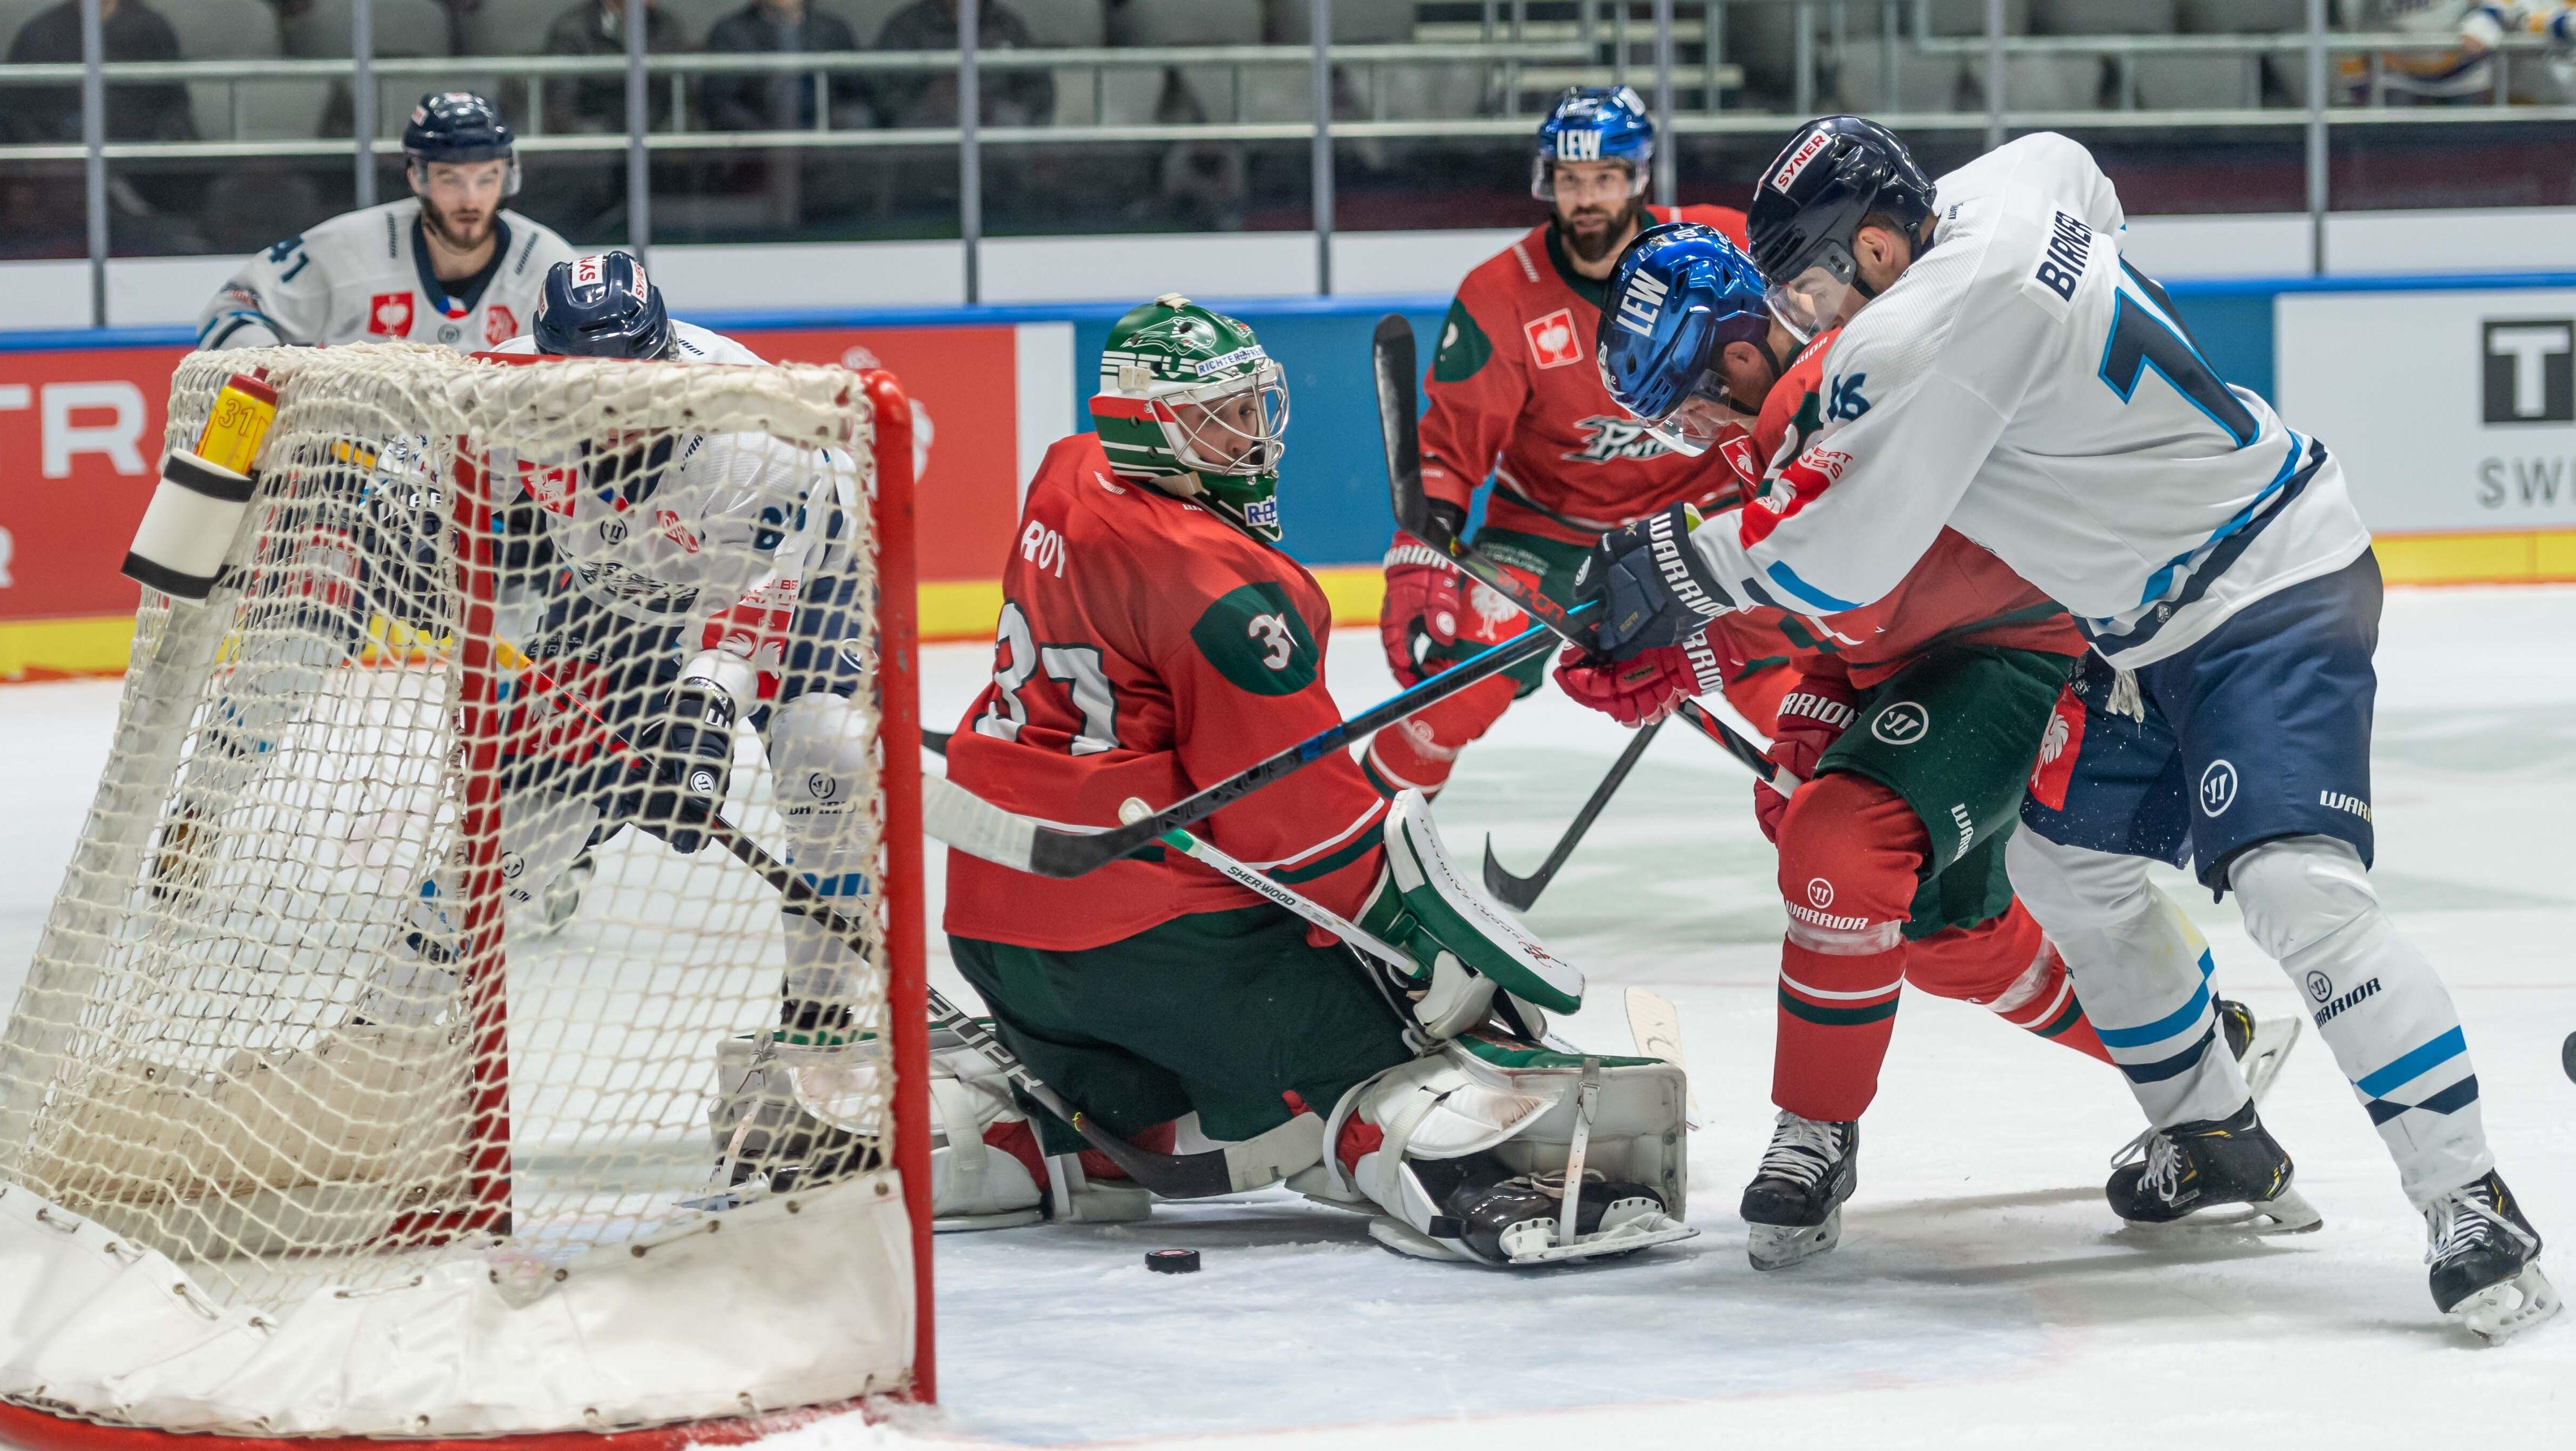 Spielszene Augsburger Panther - Bili Tygri Liberec